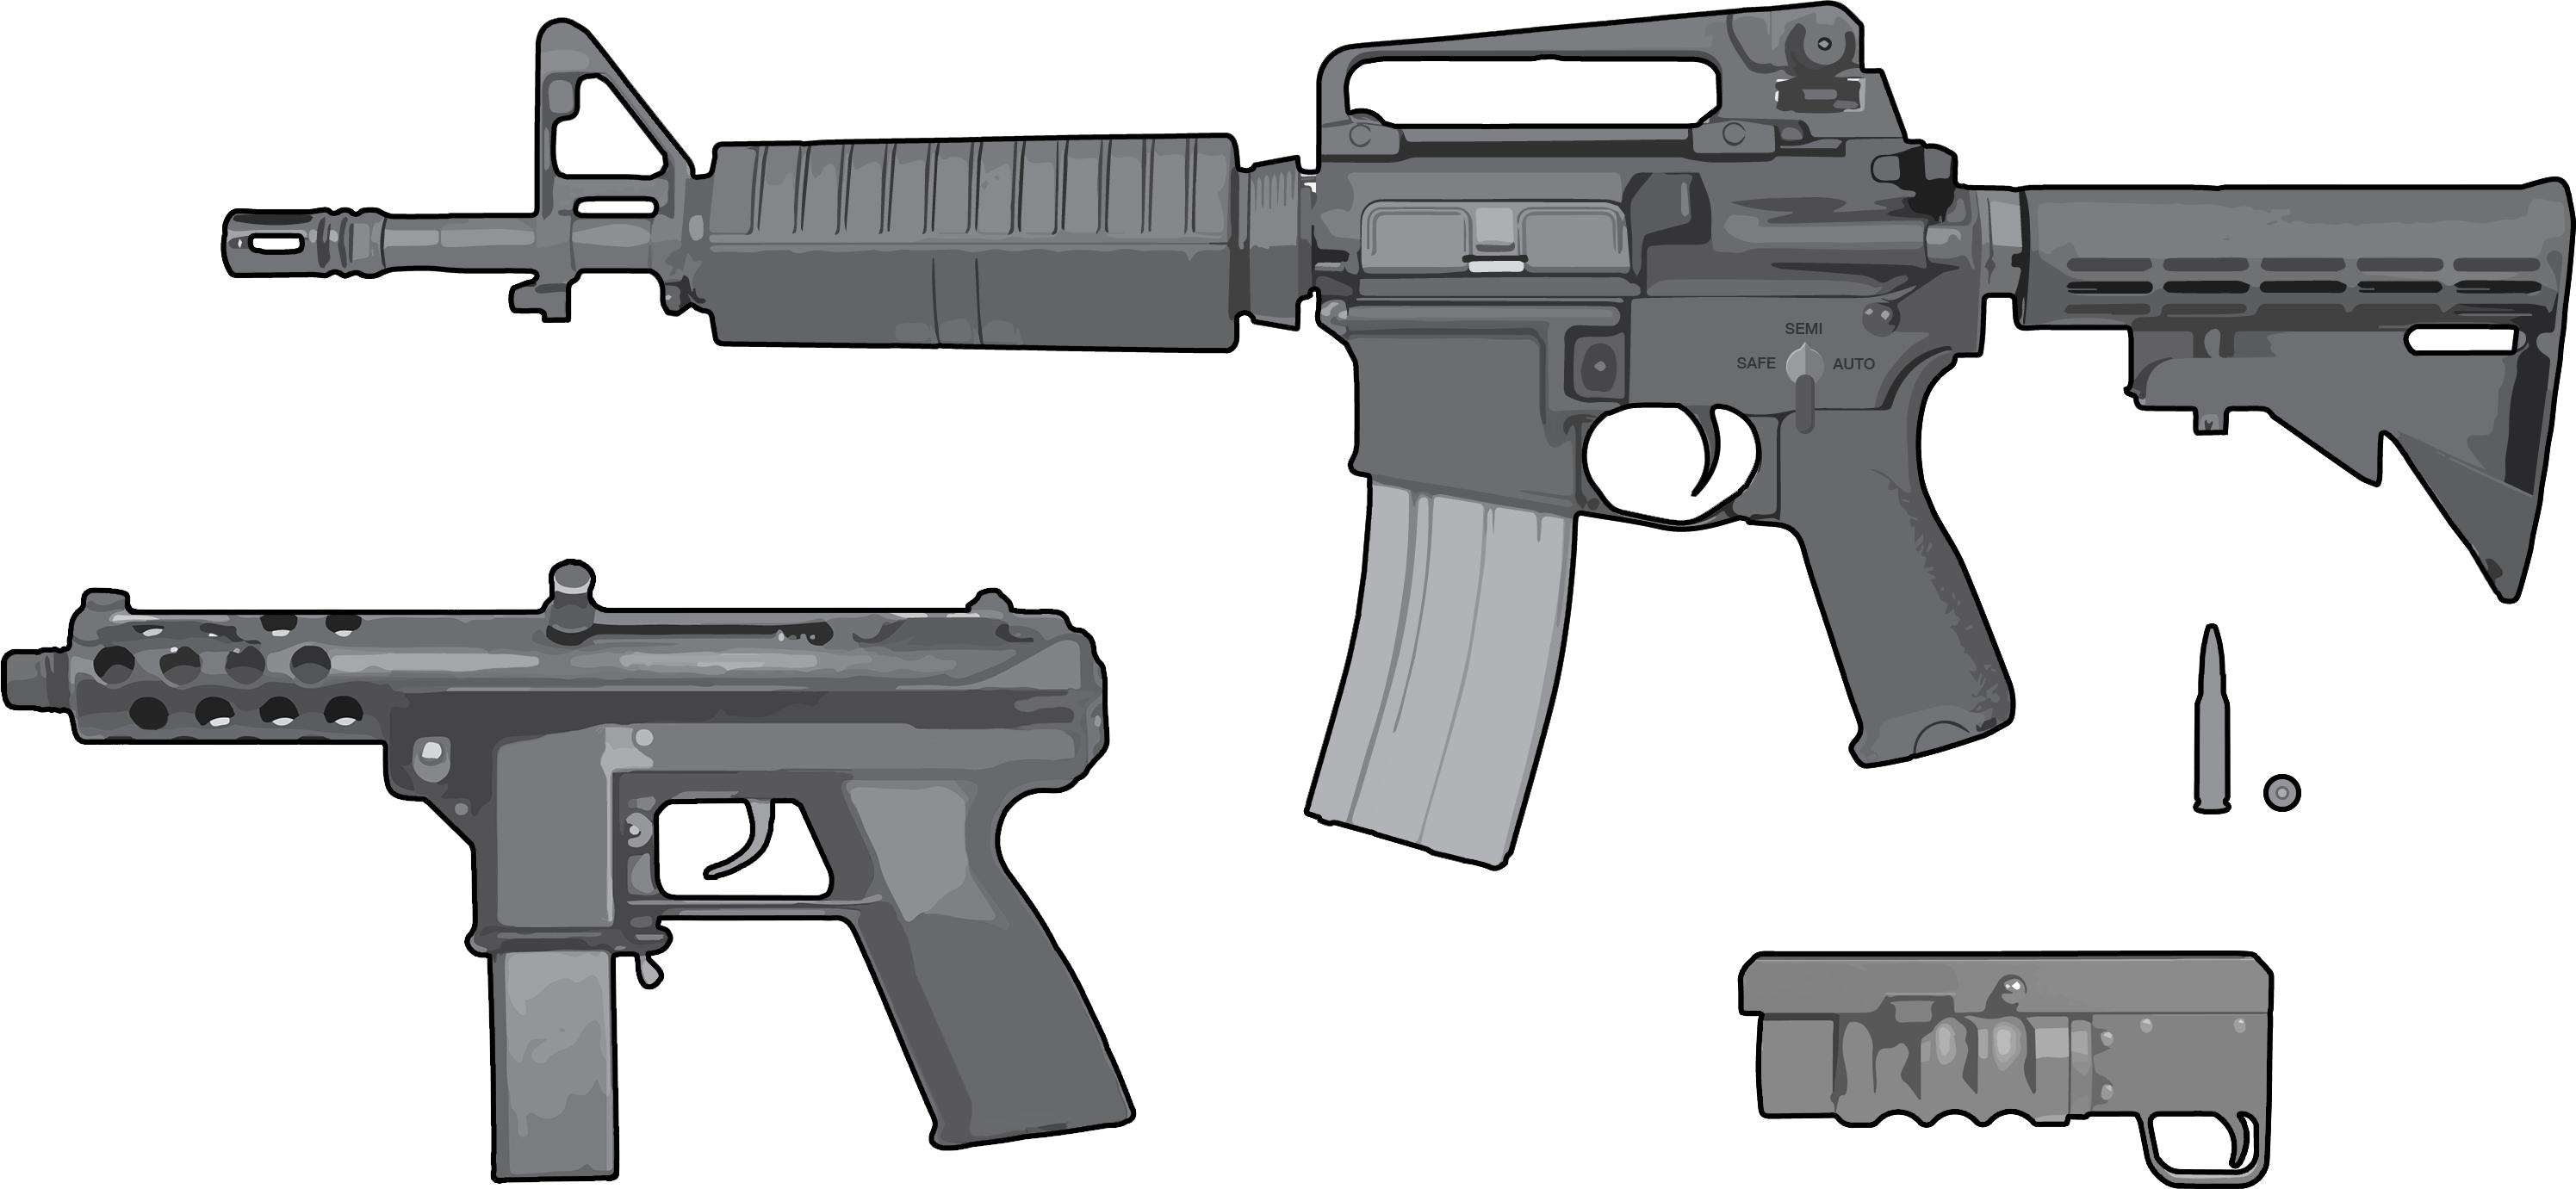 mutable quintessence: the parts that make an assault weapon   trendct